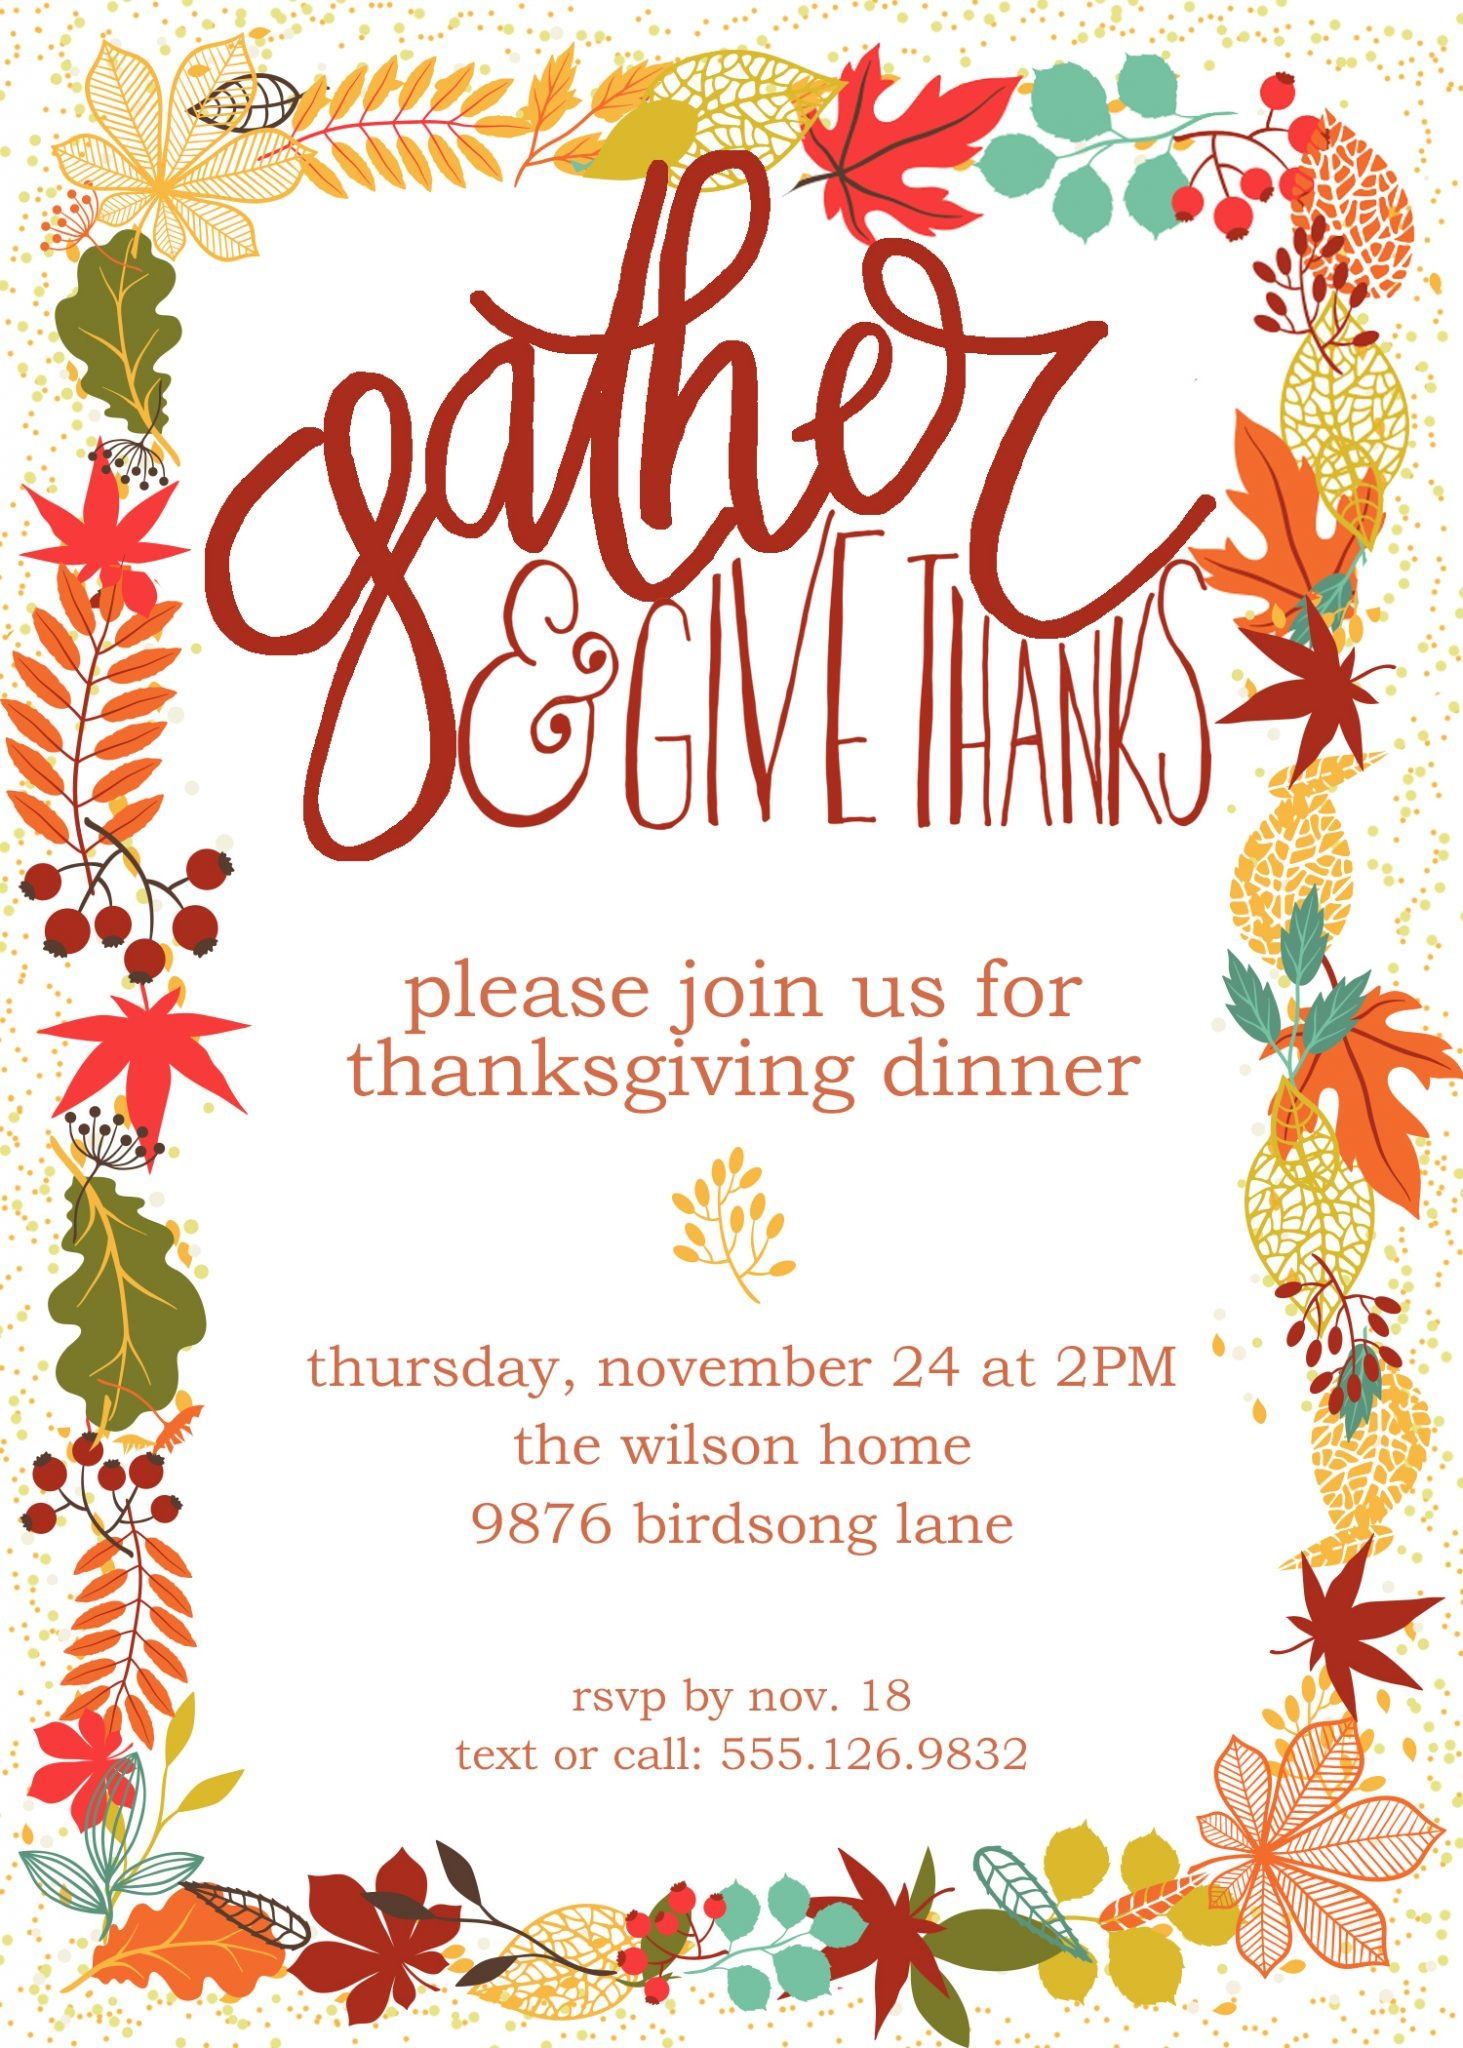 Customizable Thanksgiving Invitation | Free Printable - Free Printable Thanksgiving Invitations